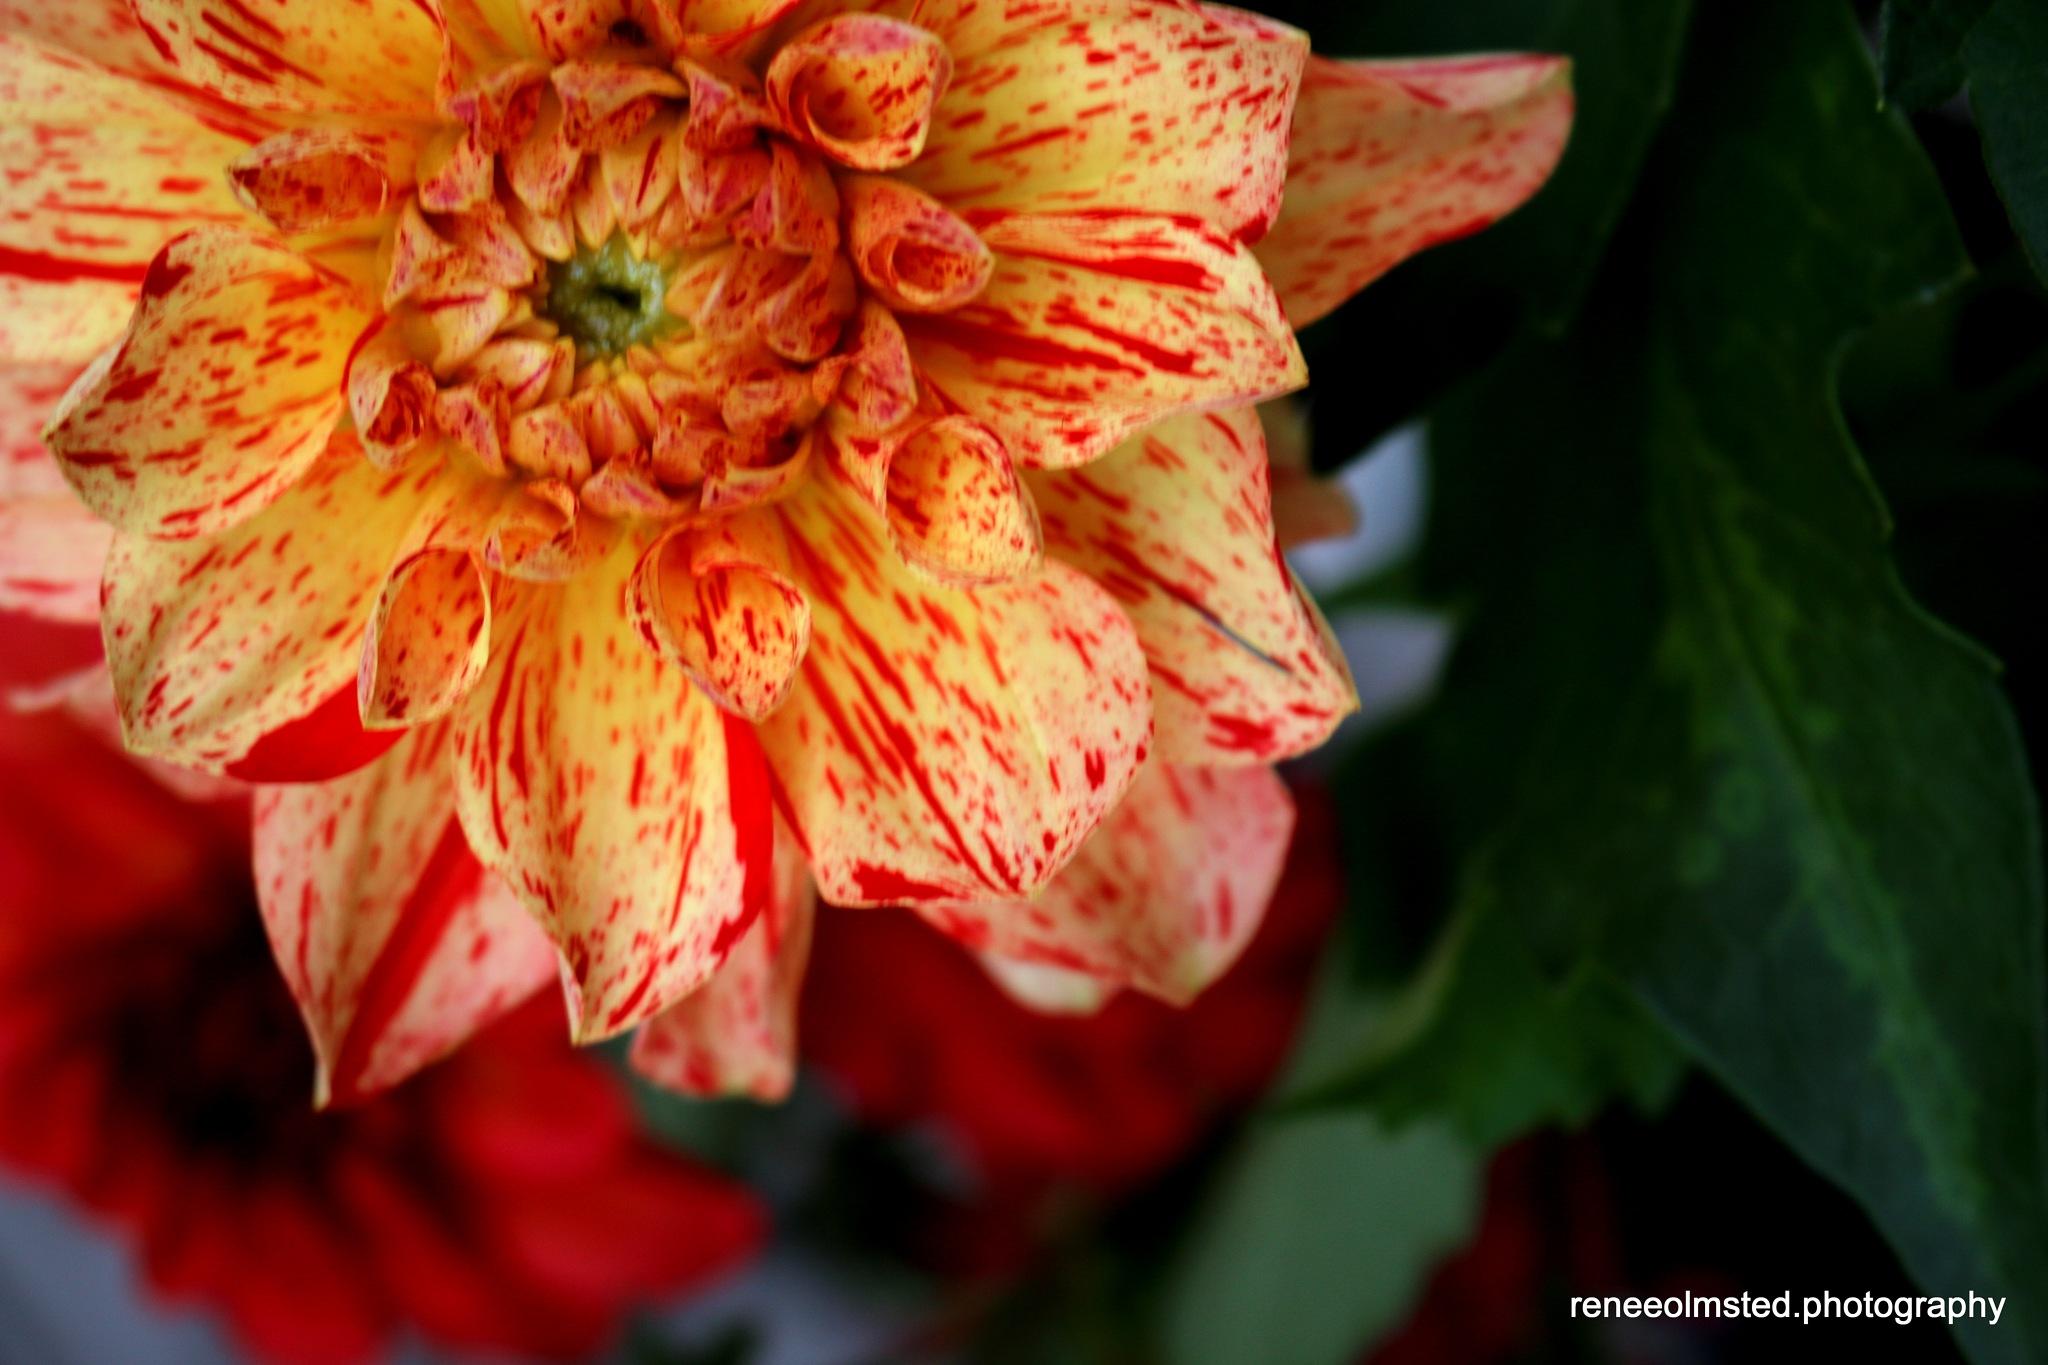 Delightful Dahlia by Renee Olmsted